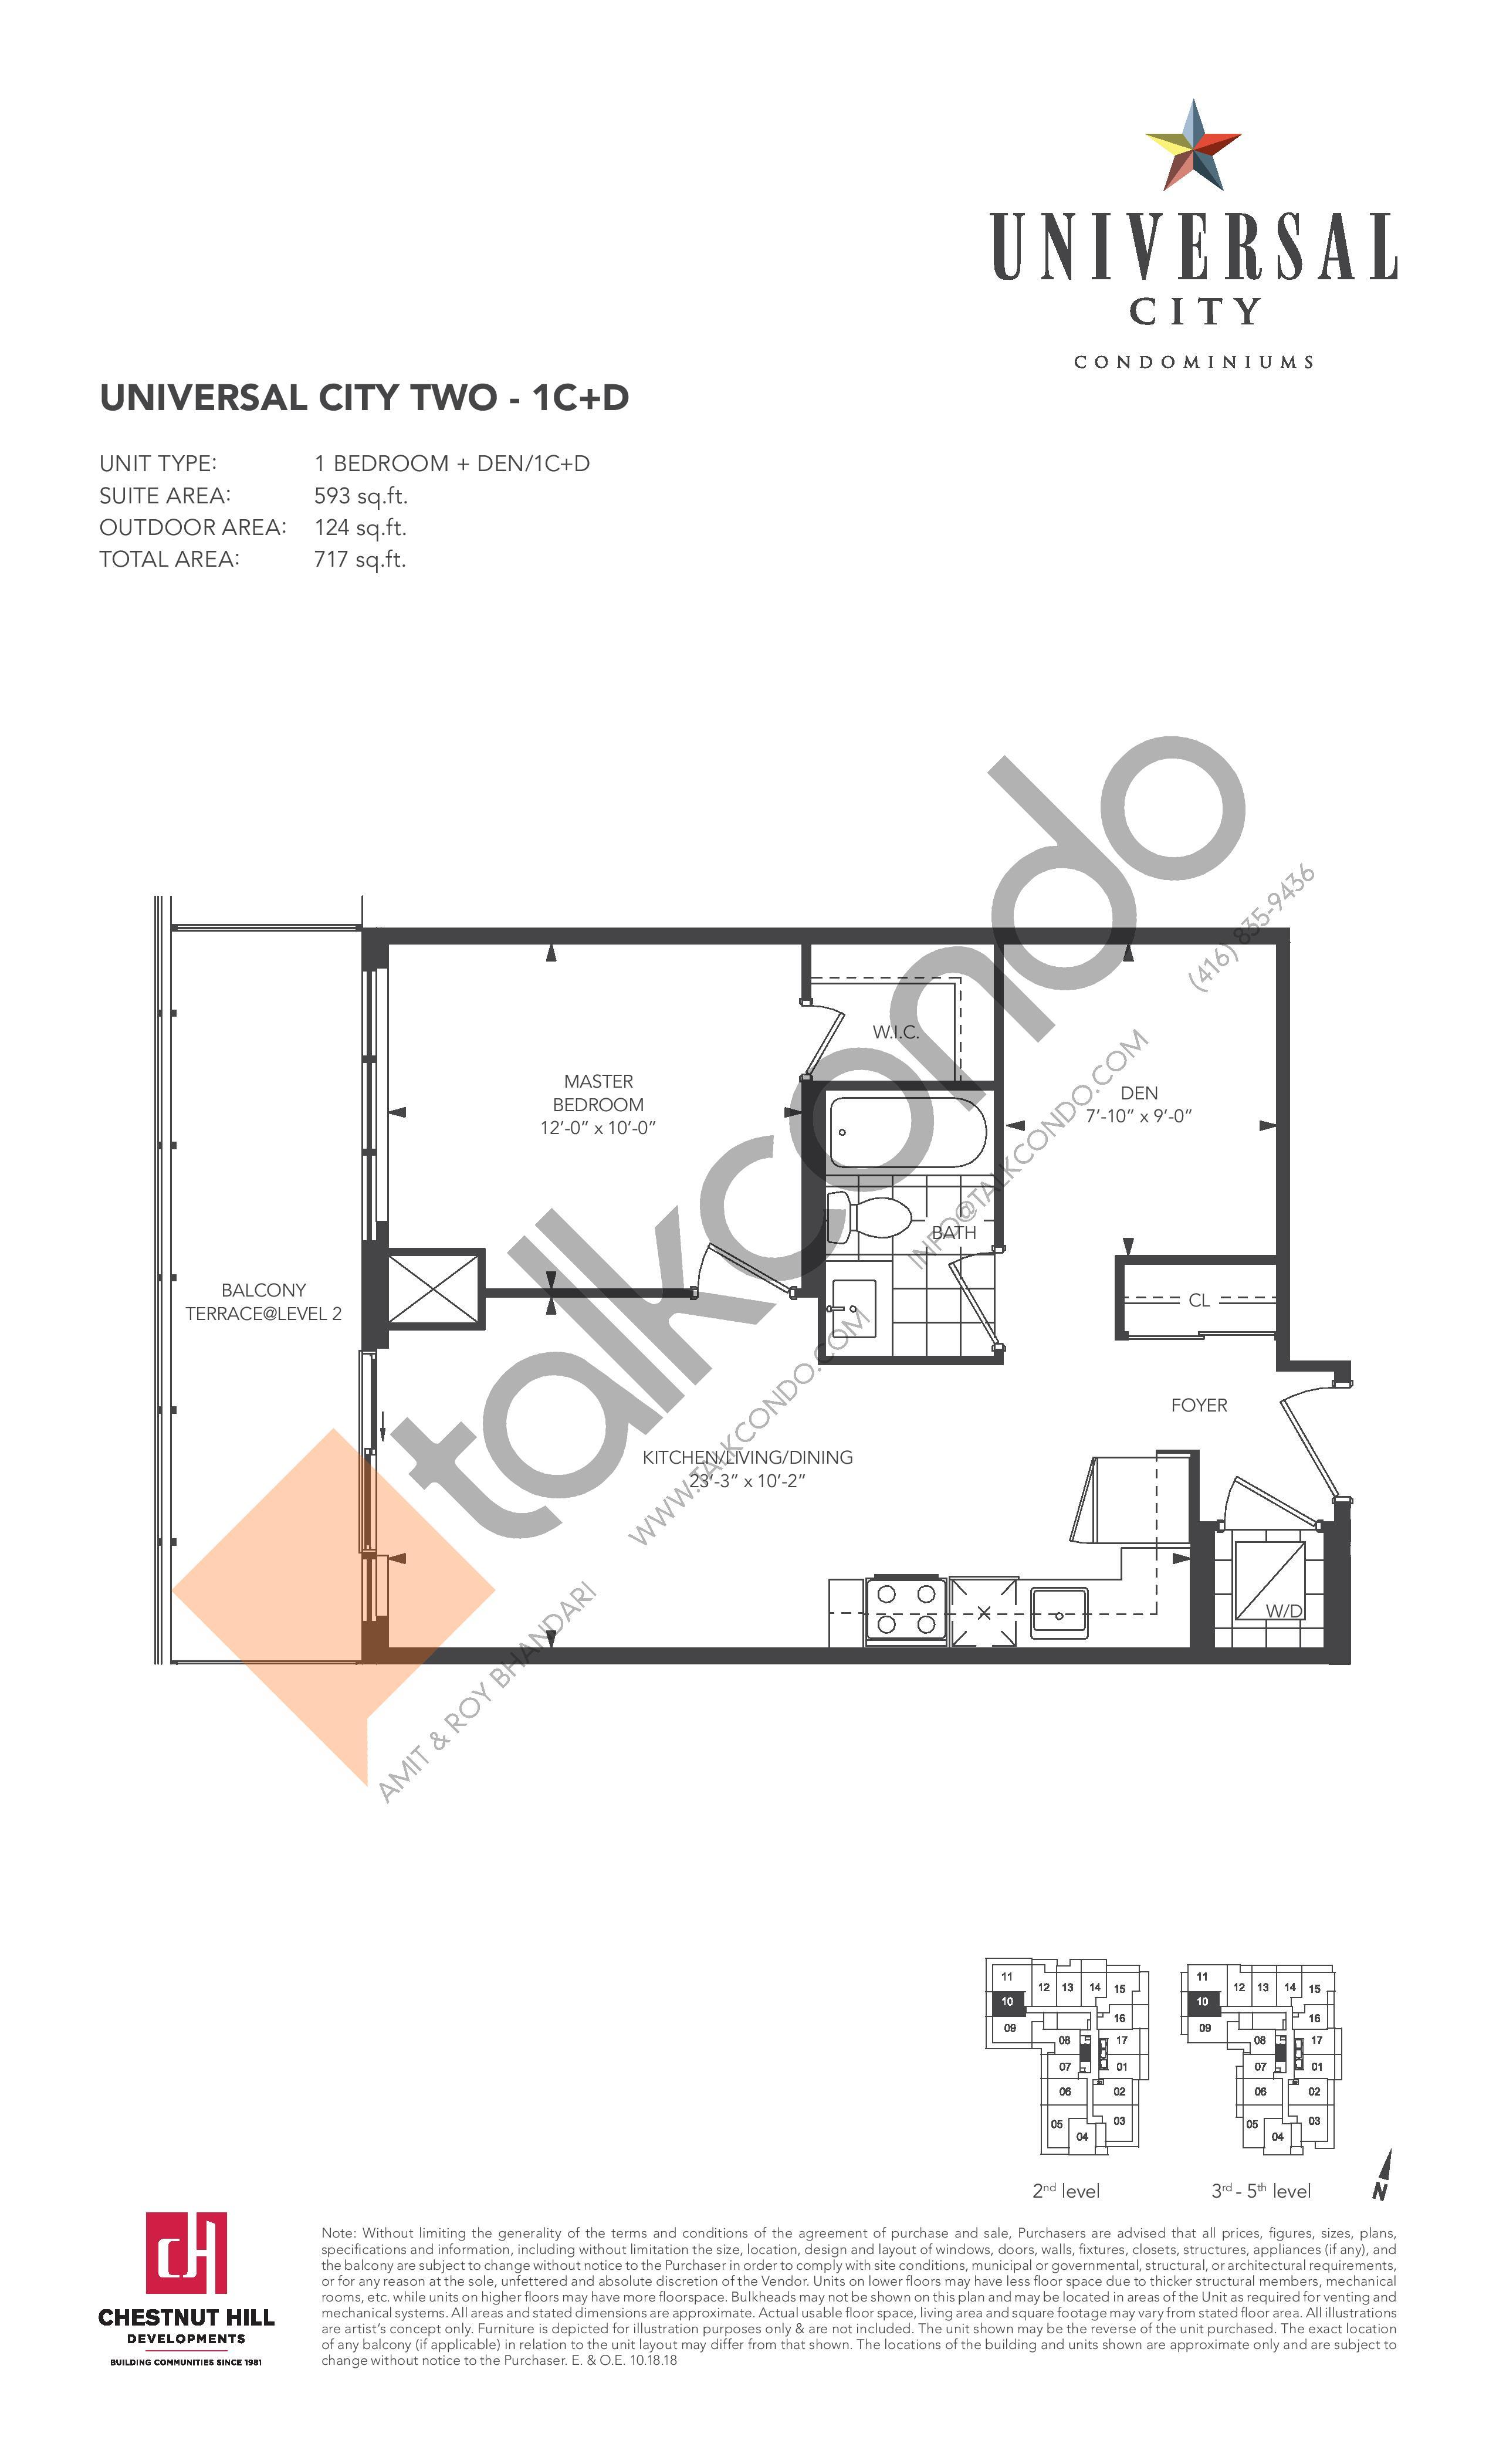 1C+D Floor Plan at Universal City 2 Condos - 593 sq.ft